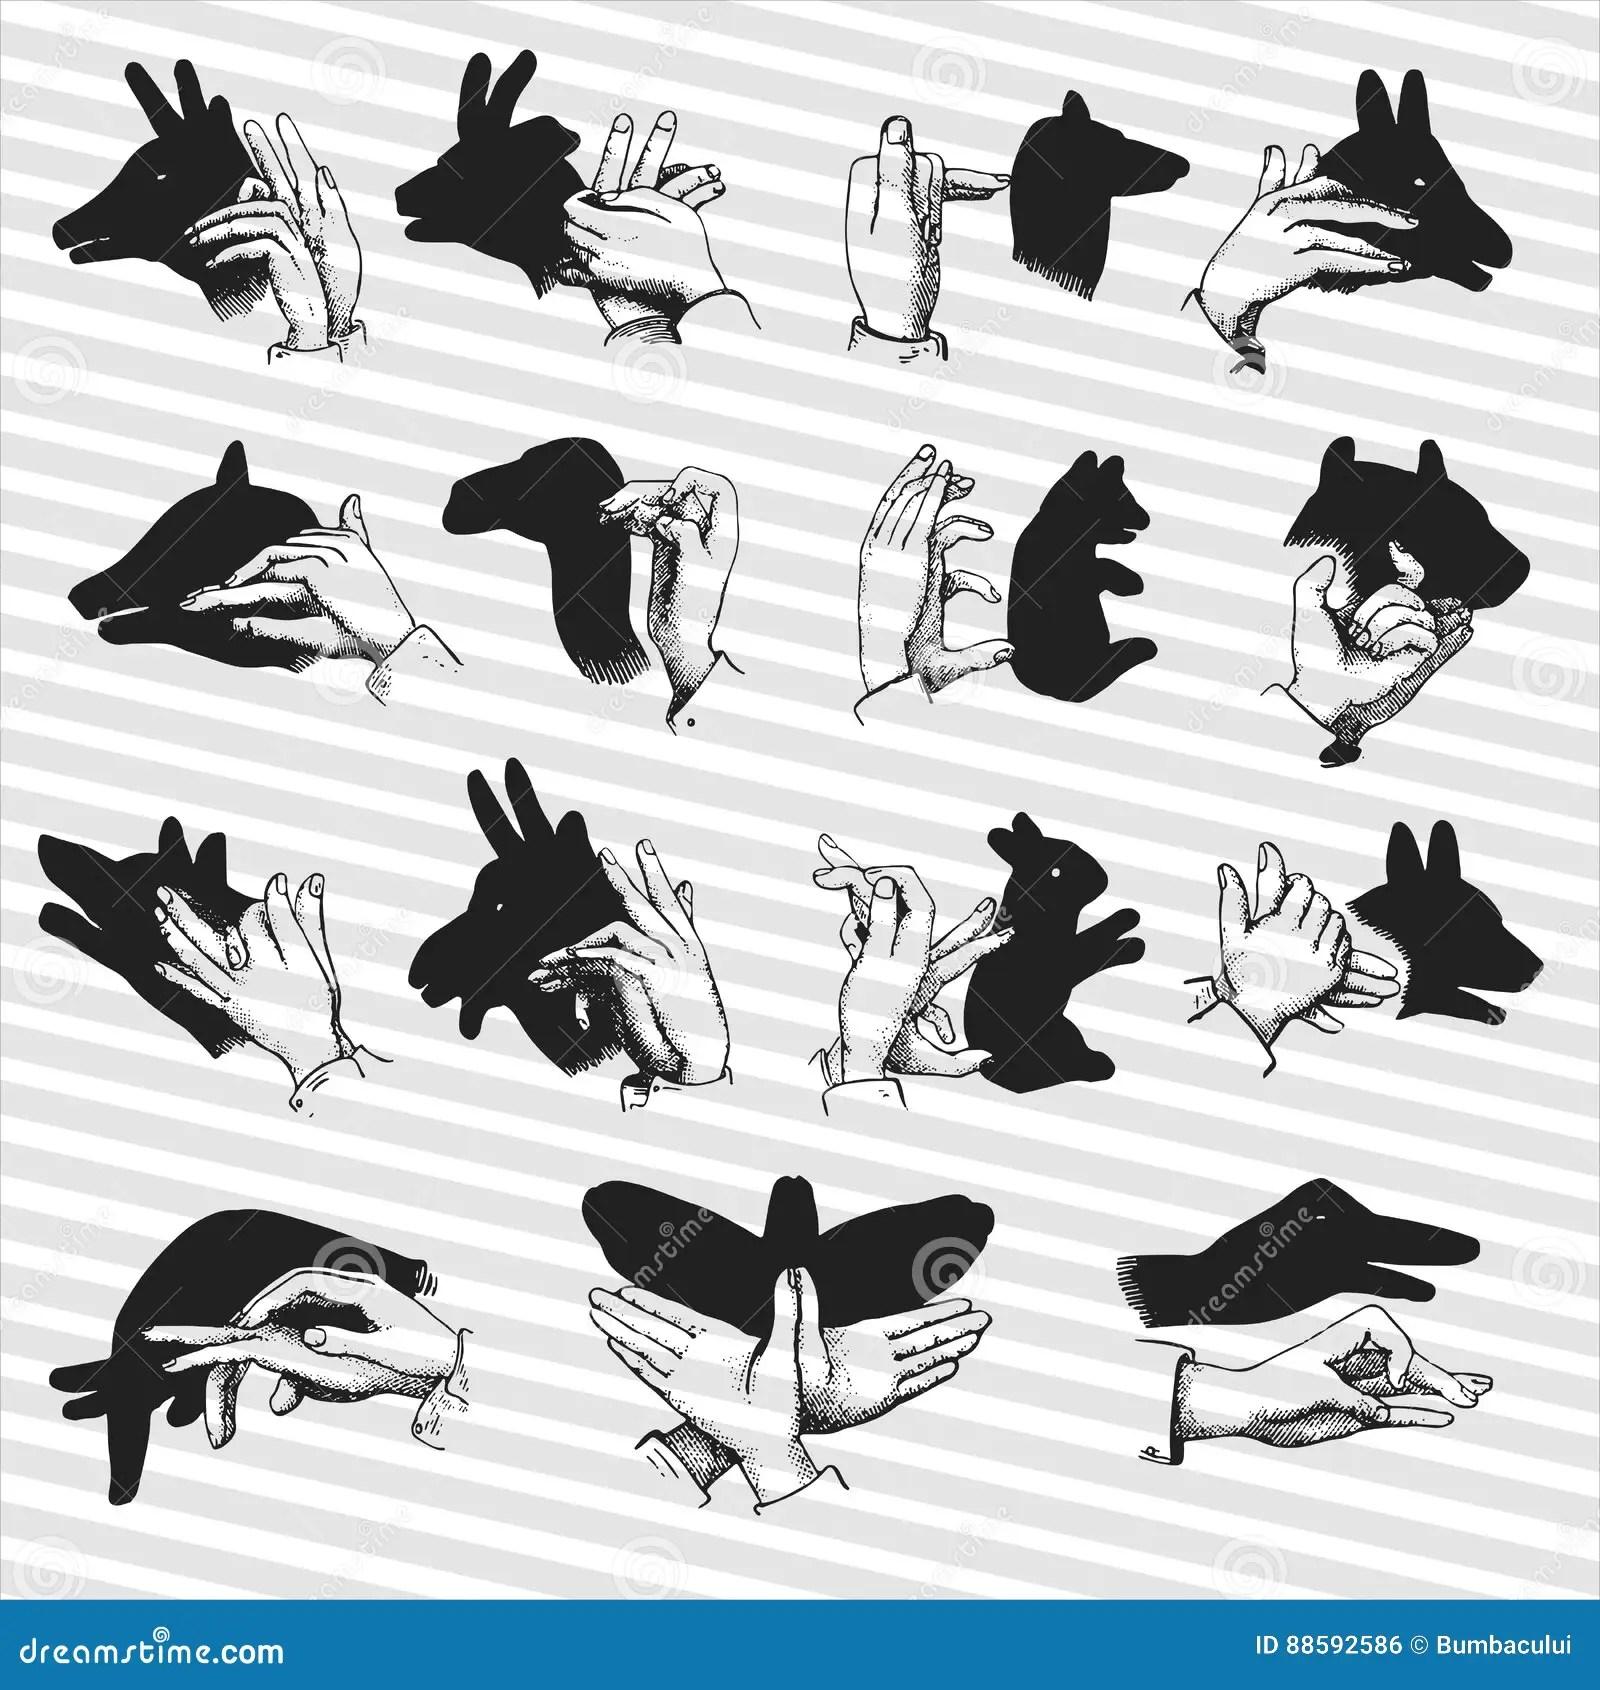 Hand Shadow Animal Puppets Illustrations Stock